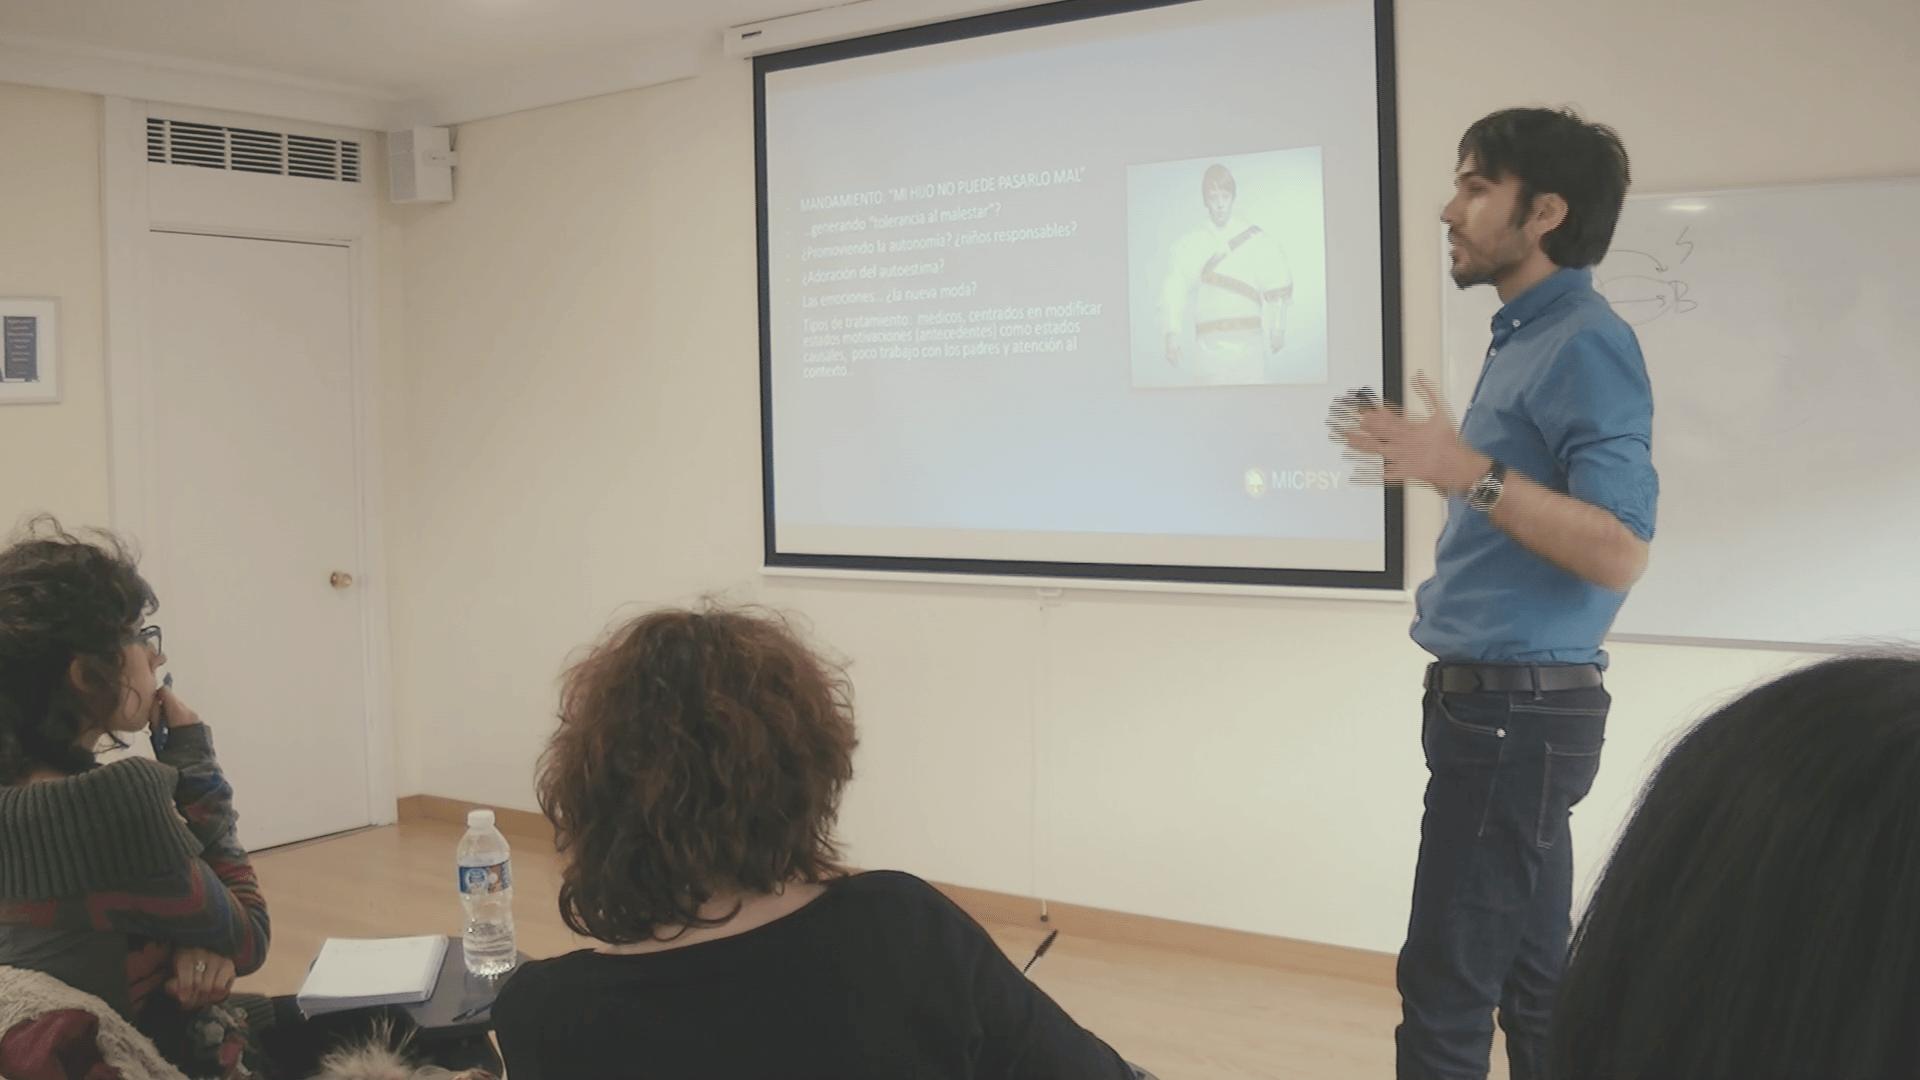 formación continua en Terapias Contextuales